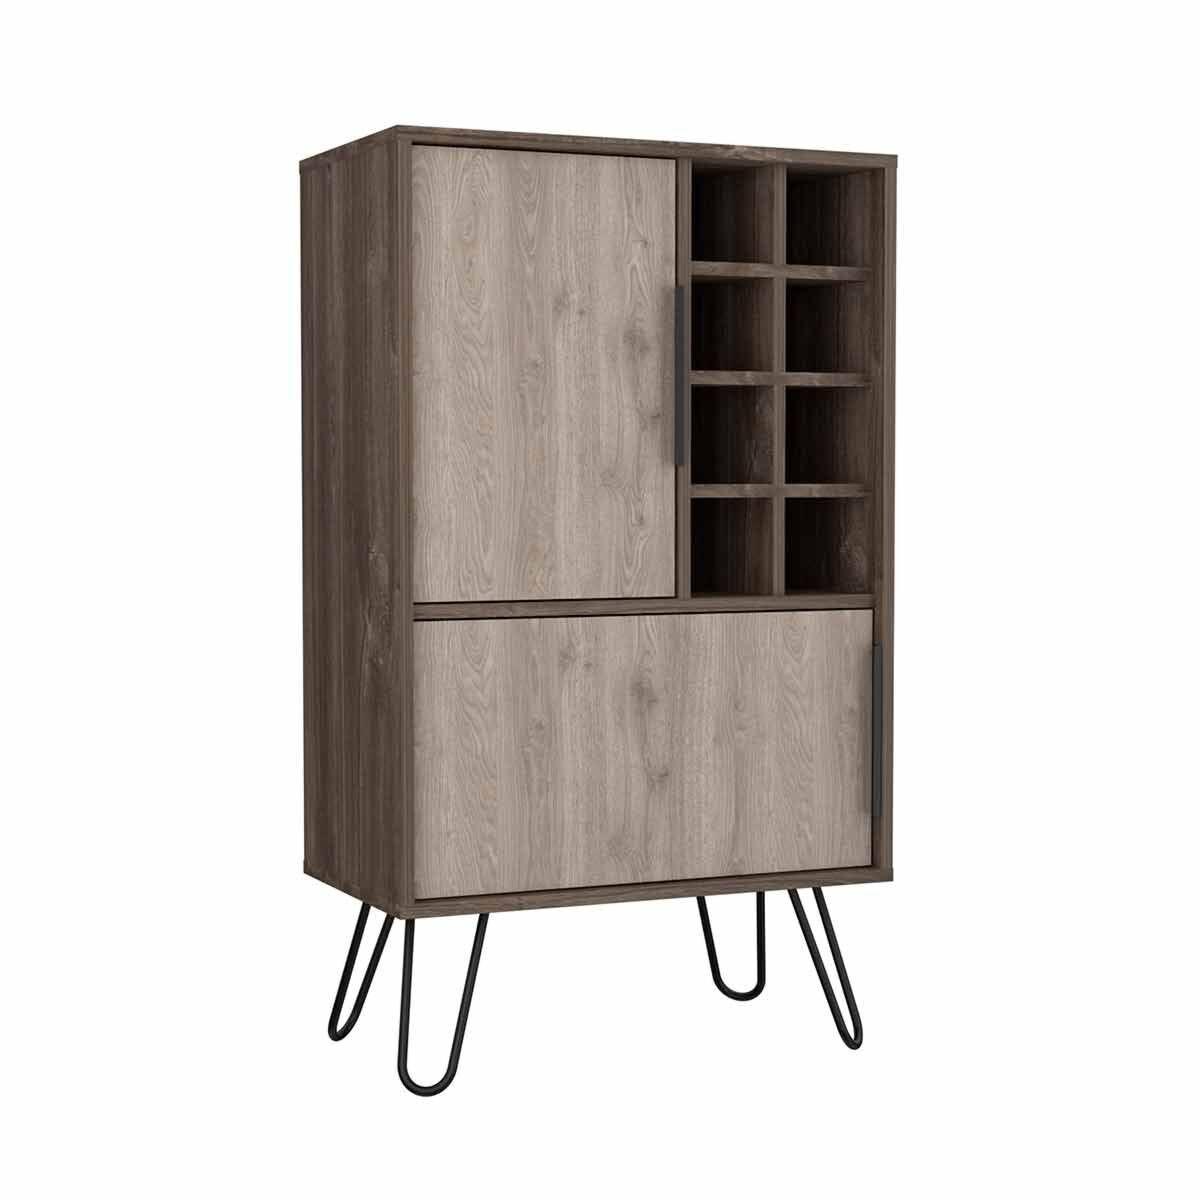 Nevada Medium Bar Cabinet with Hairpin Legs